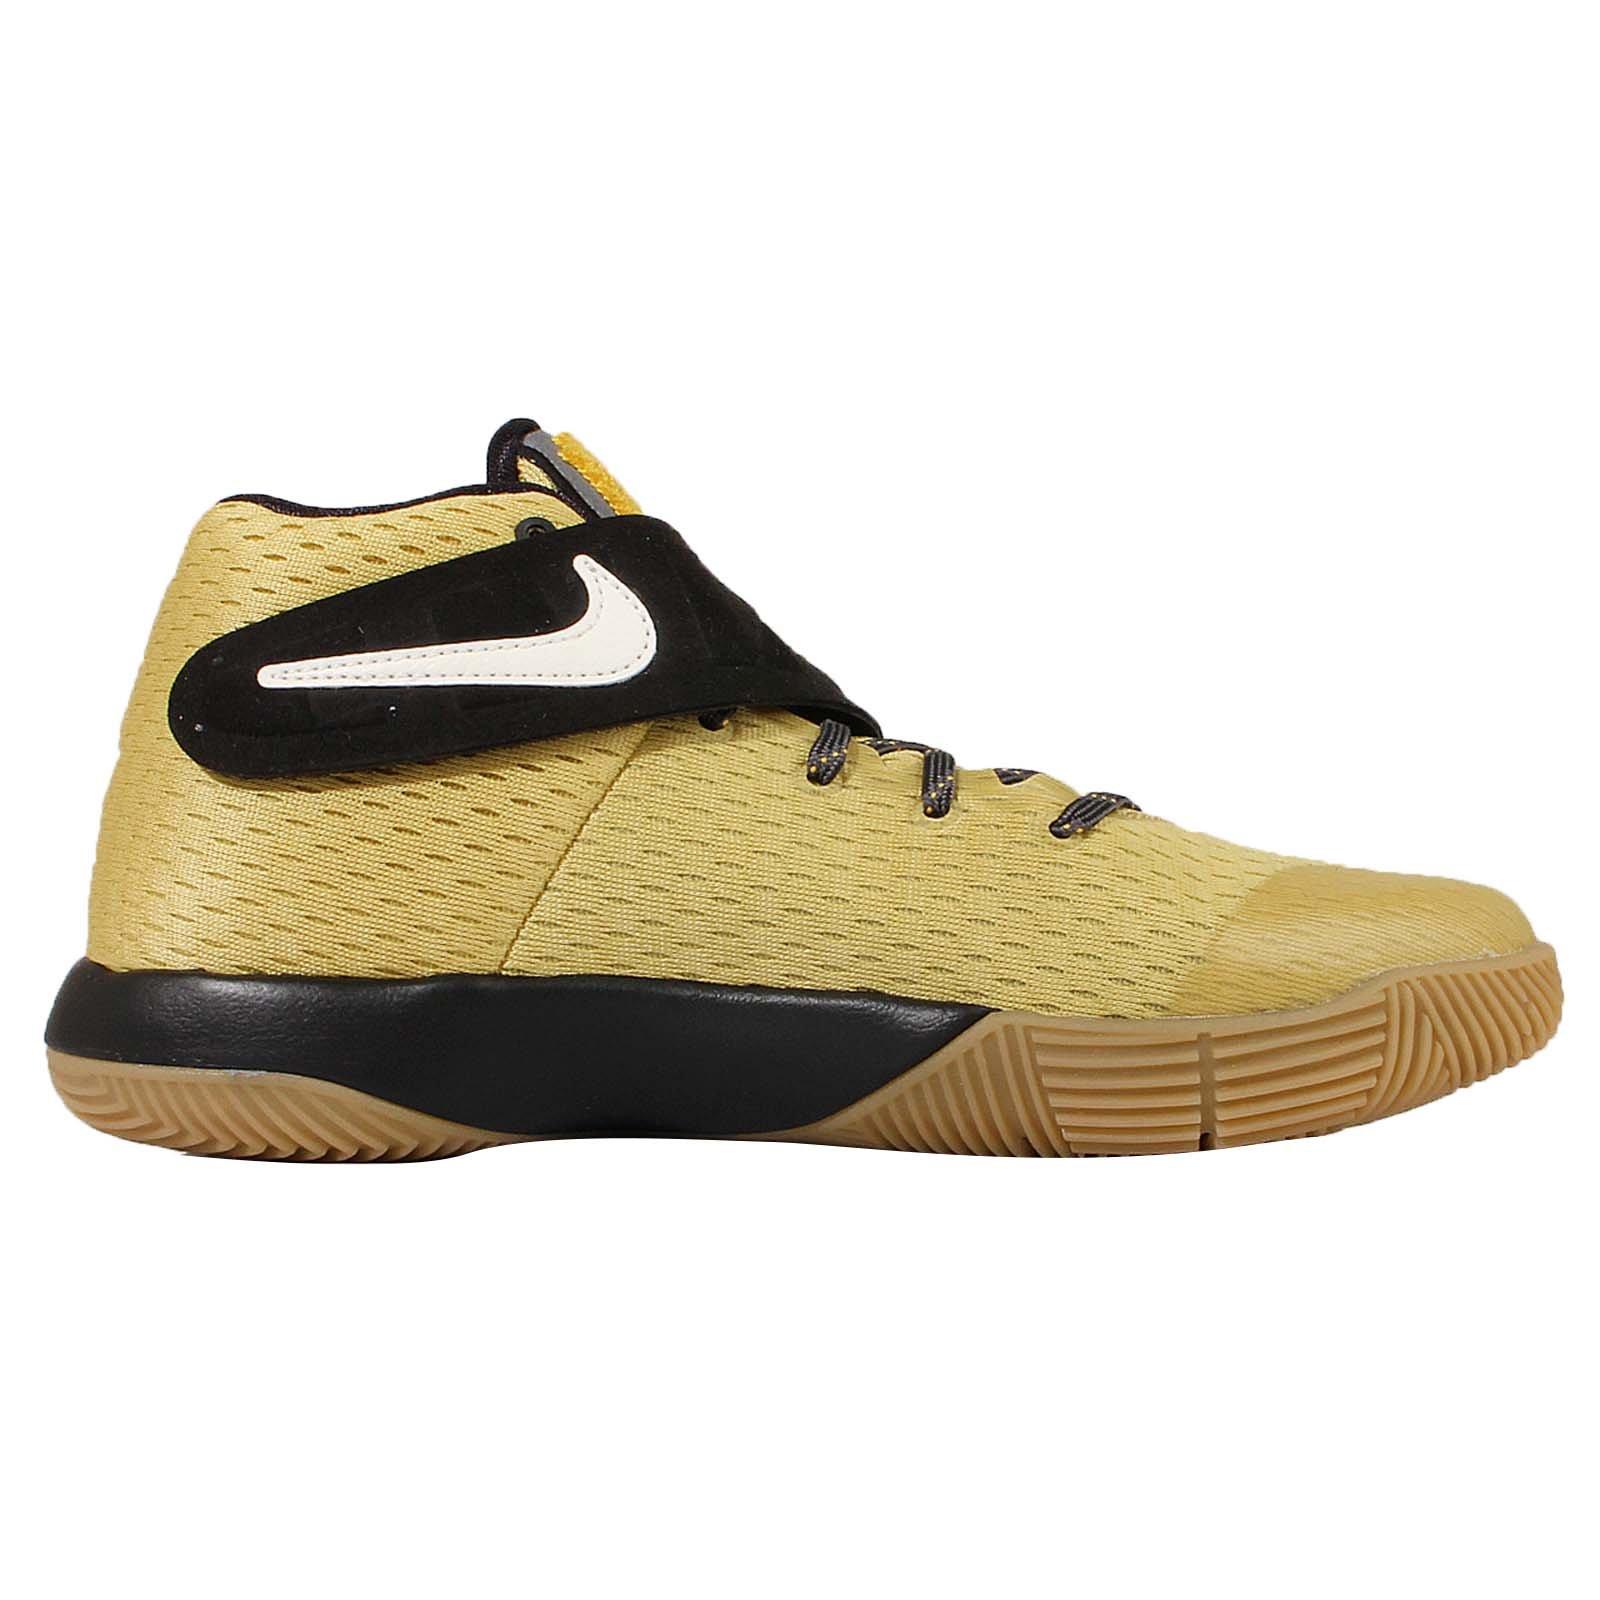 Nike Kids Kyrie 2 AS GS, ALL STAR-CELERY/VARSITY MAIZE-BLACK, Youth Size 6 by Nike (Image #3)